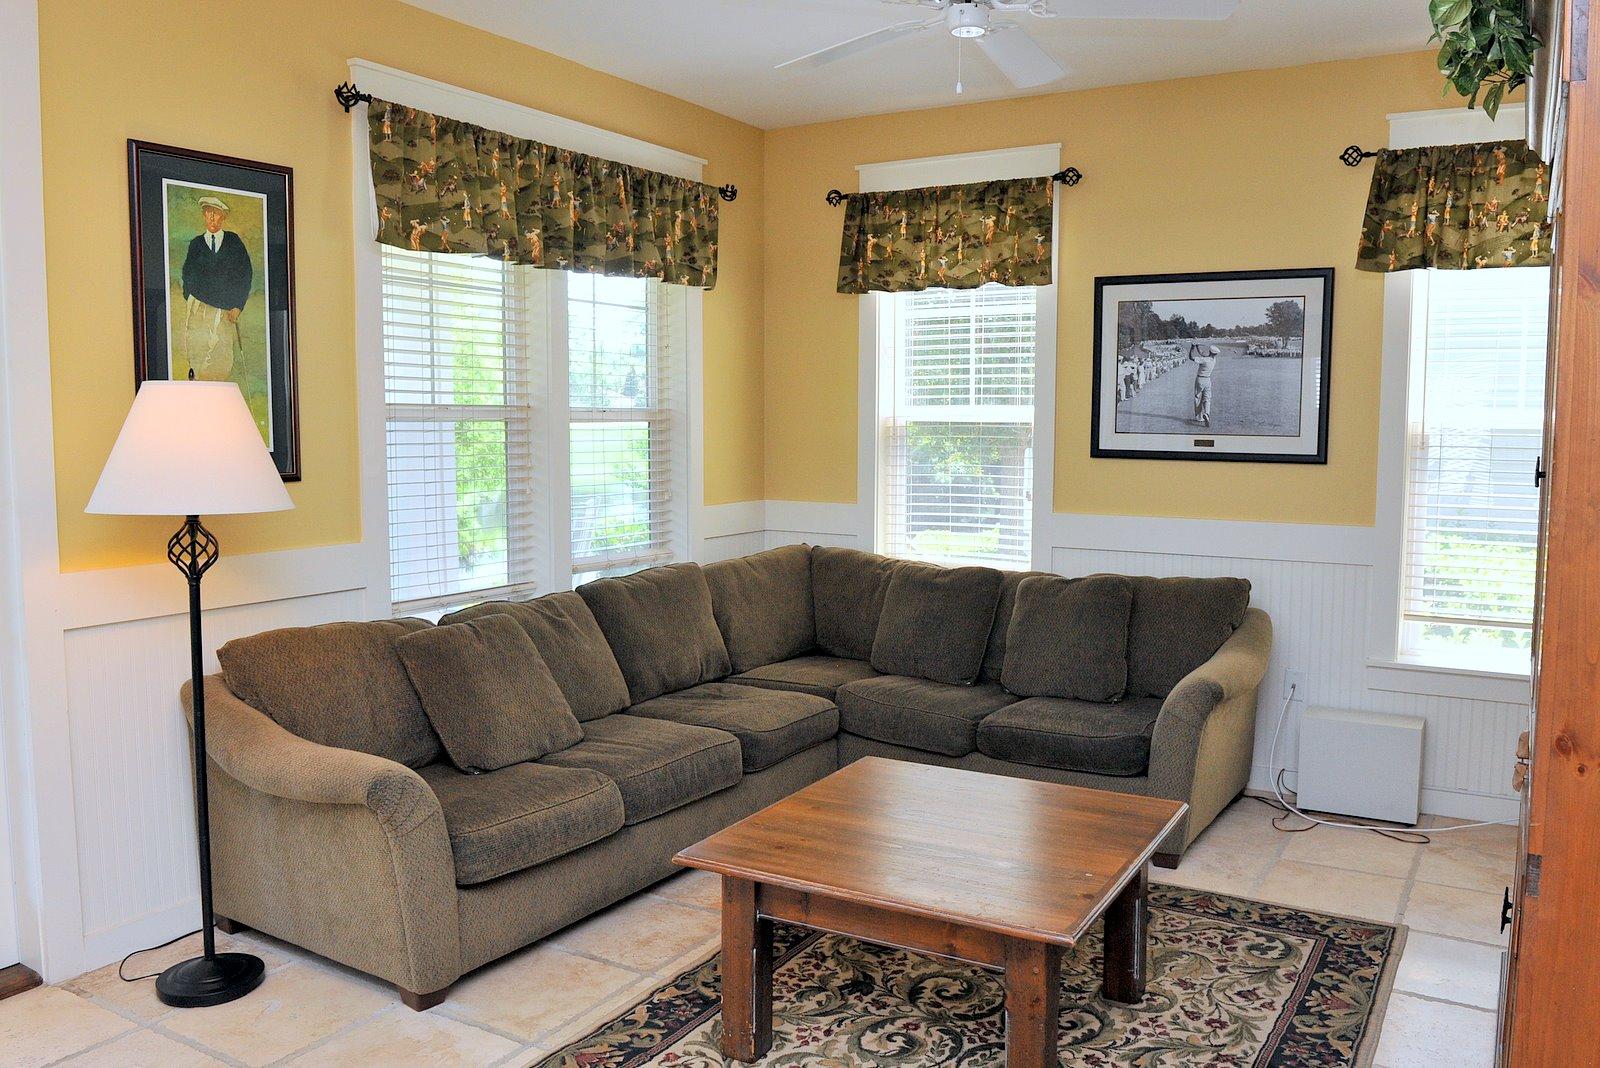 1280 Laurel Grove Condo rental in Sandestin Rentals ~ Cottages and Villas  in Destin Florida - #2